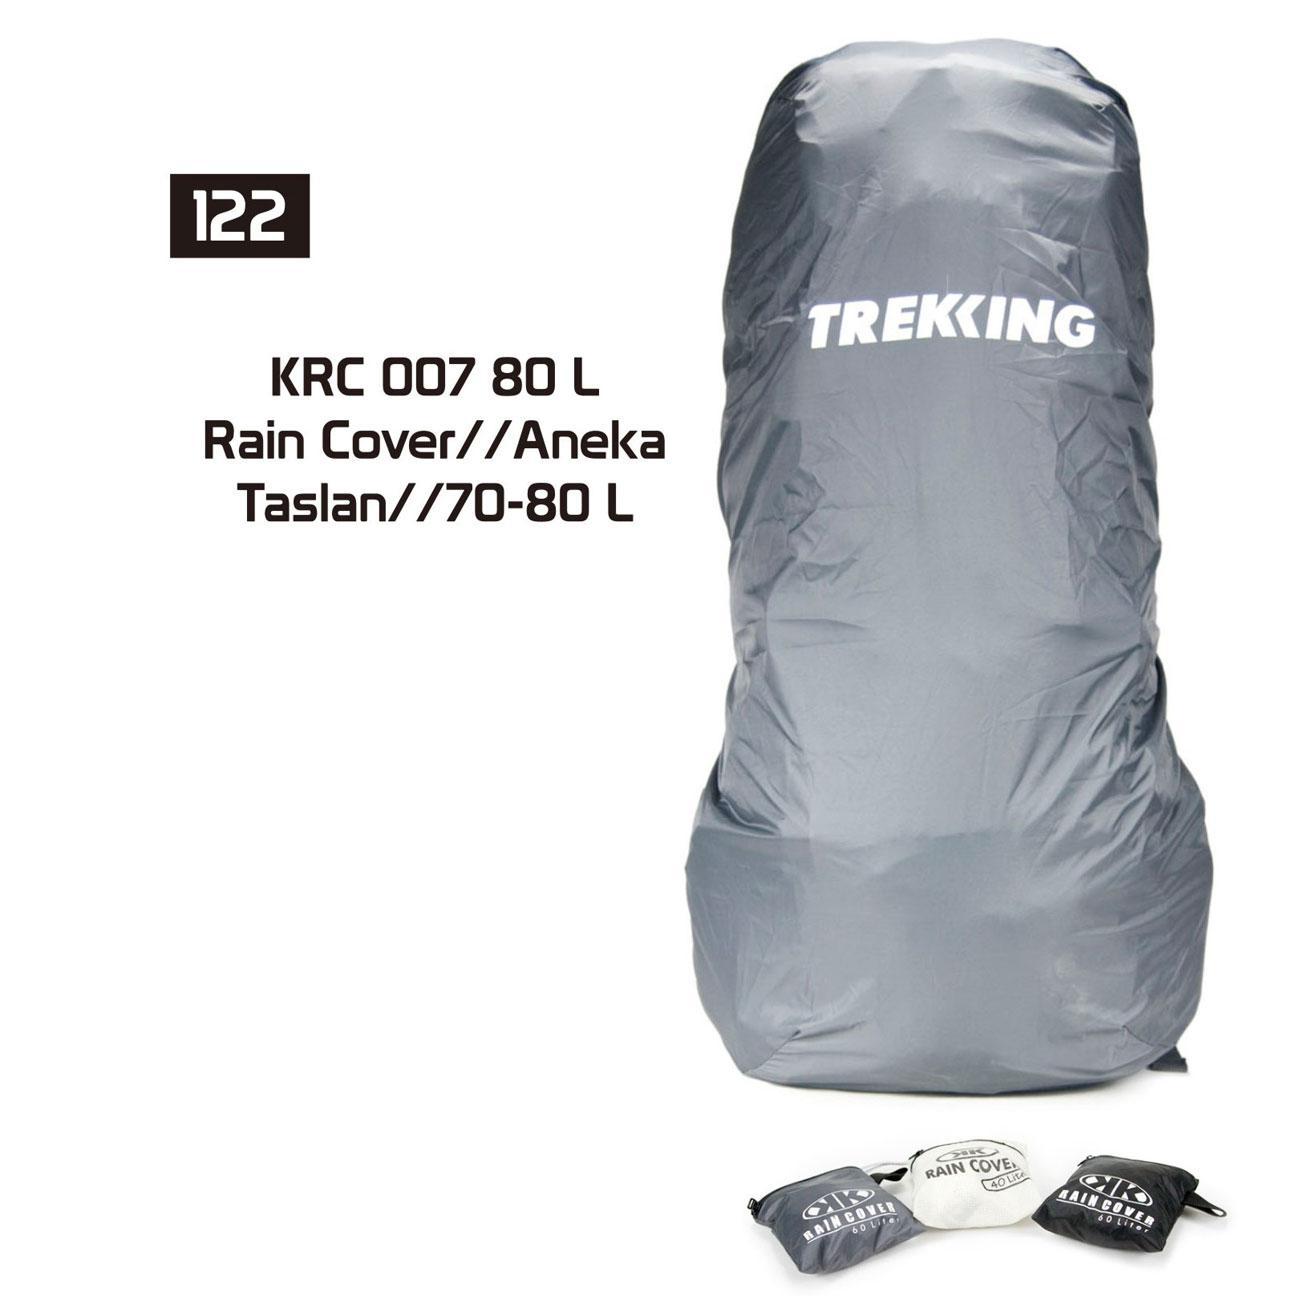 Rain Cover Bag Jas Hujan Tas 30 50l Snta Hijau Daftar Harga Kamoro 35 L Promo Pelindung Trekking Akrc 007 80